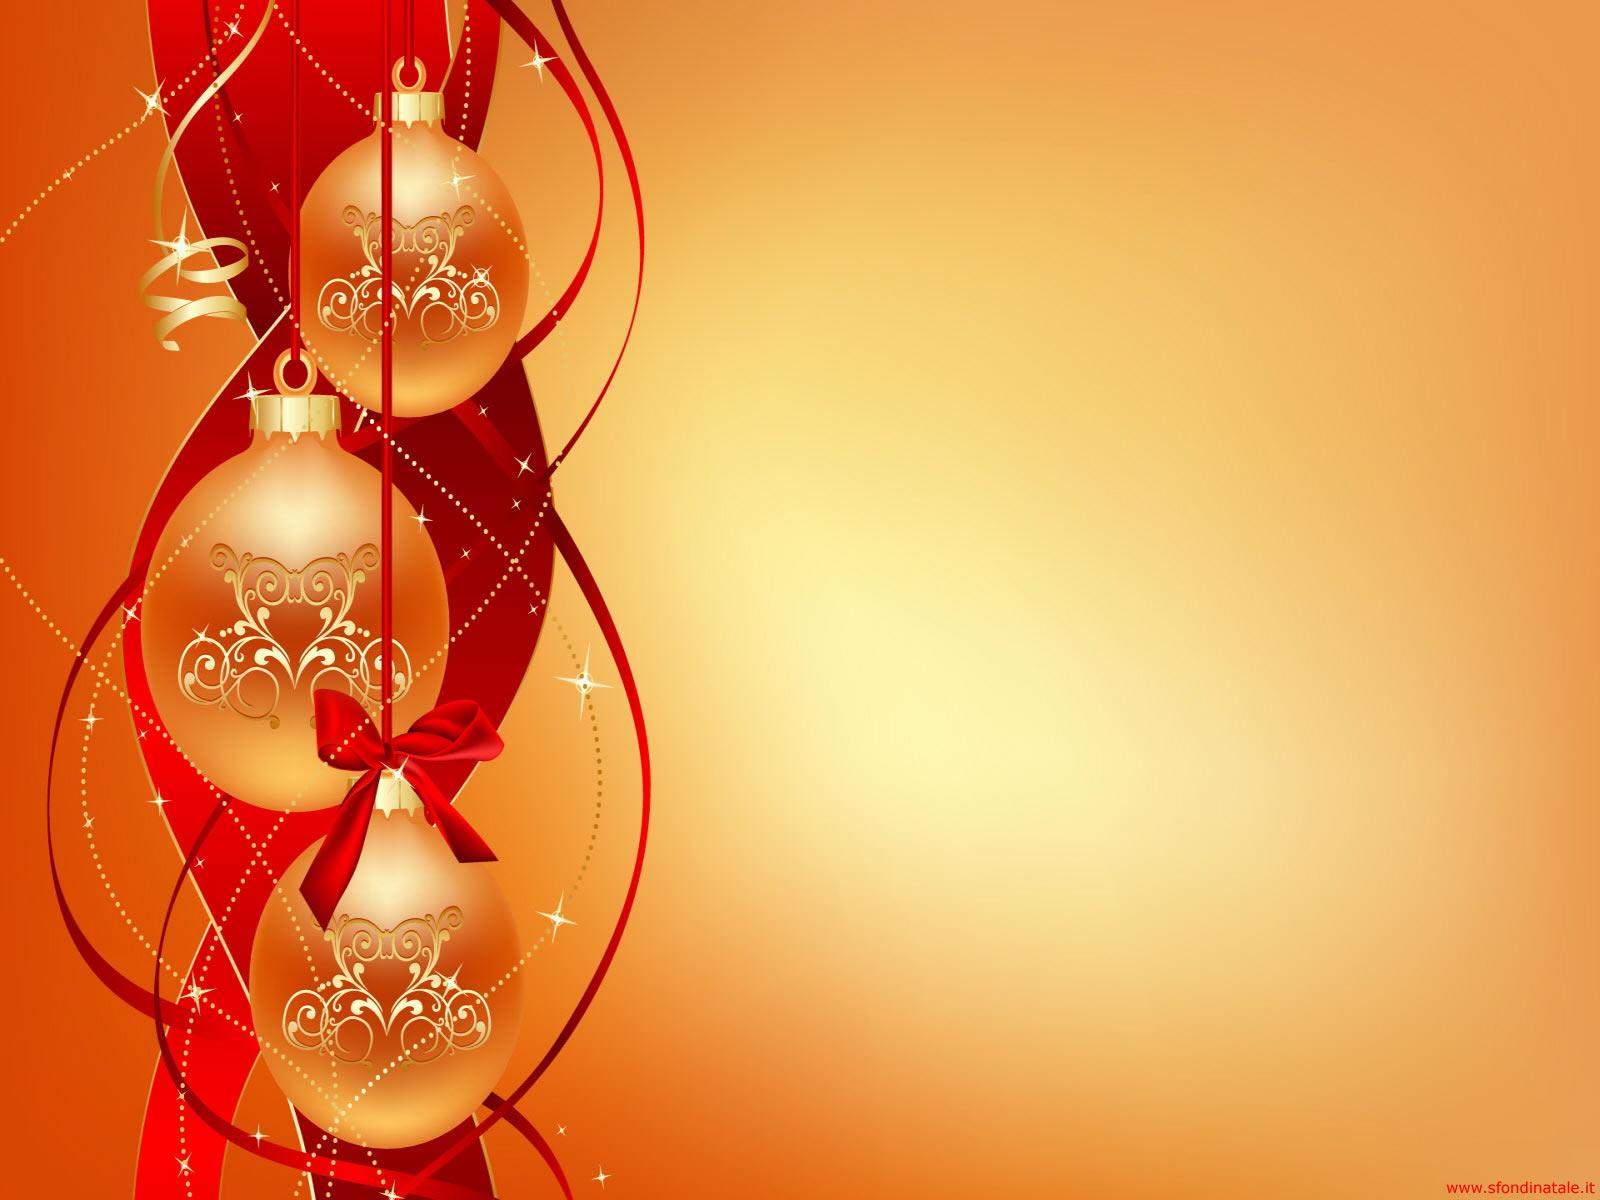 Sfondi Natale - Sfondo Natale palle